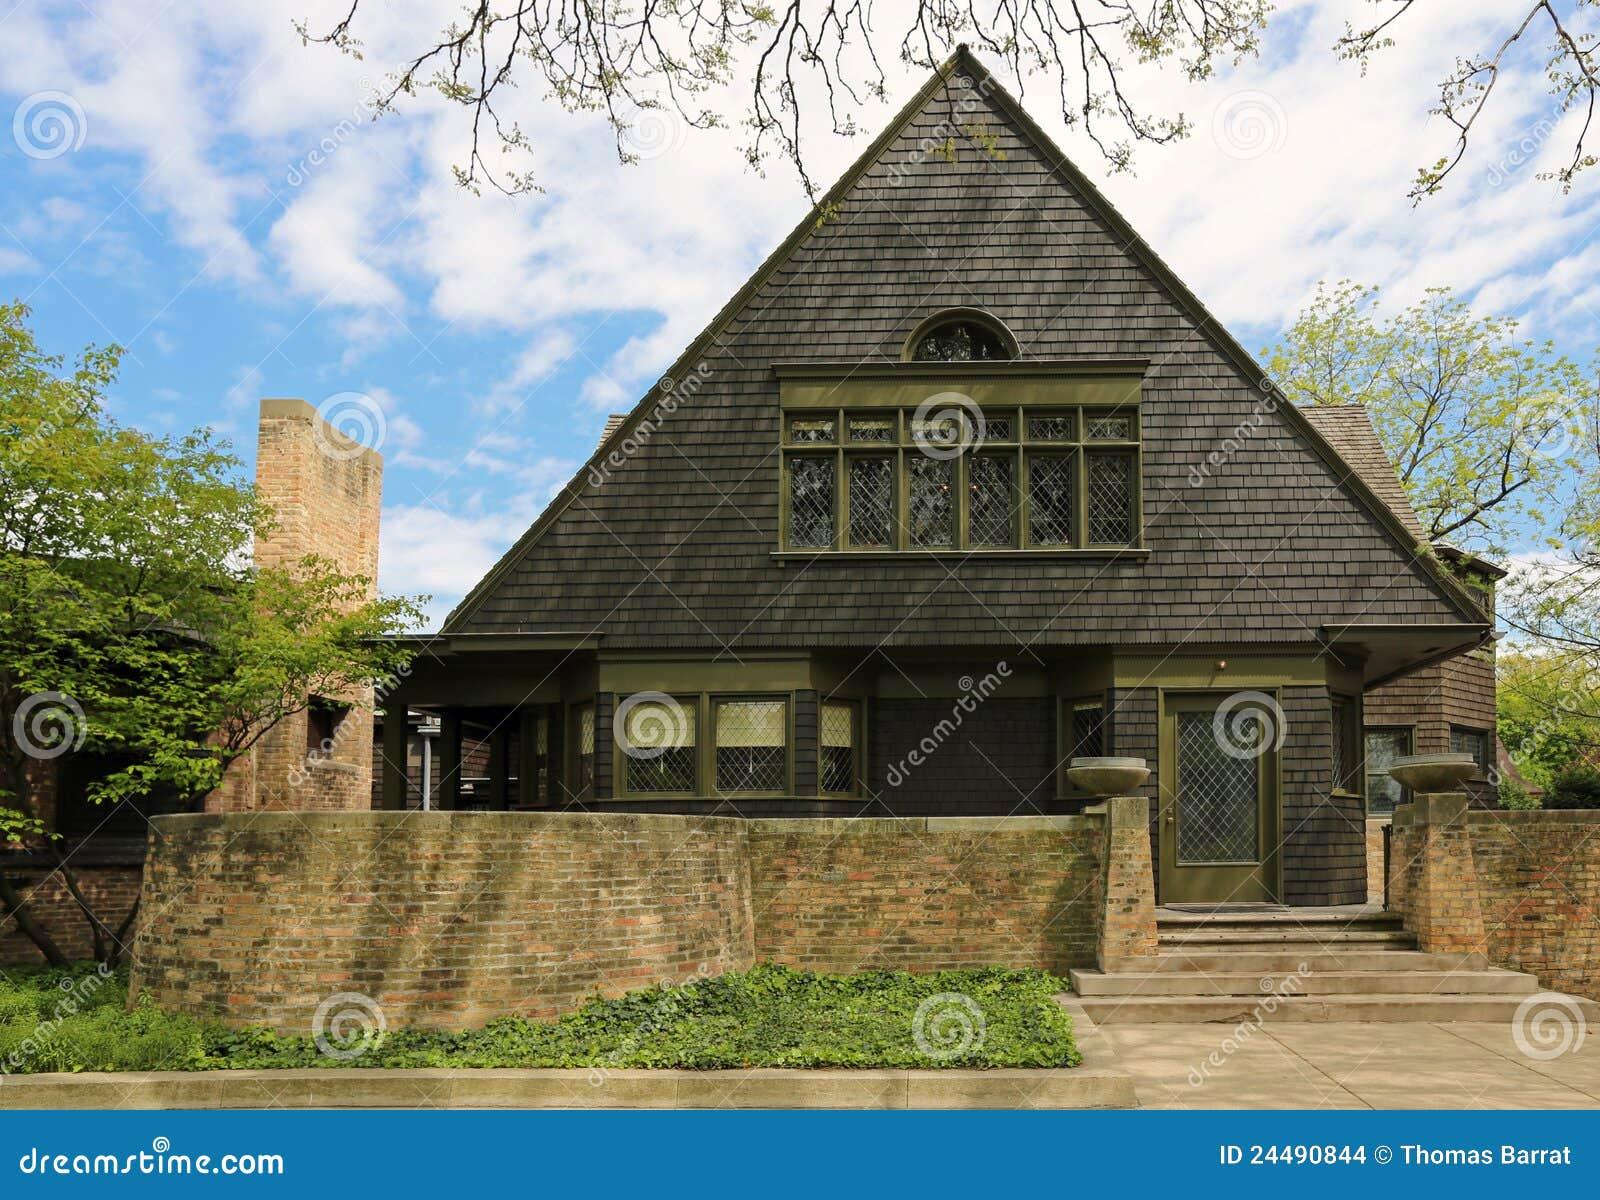 frank lloyd wright home studio stock photo image of. Black Bedroom Furniture Sets. Home Design Ideas